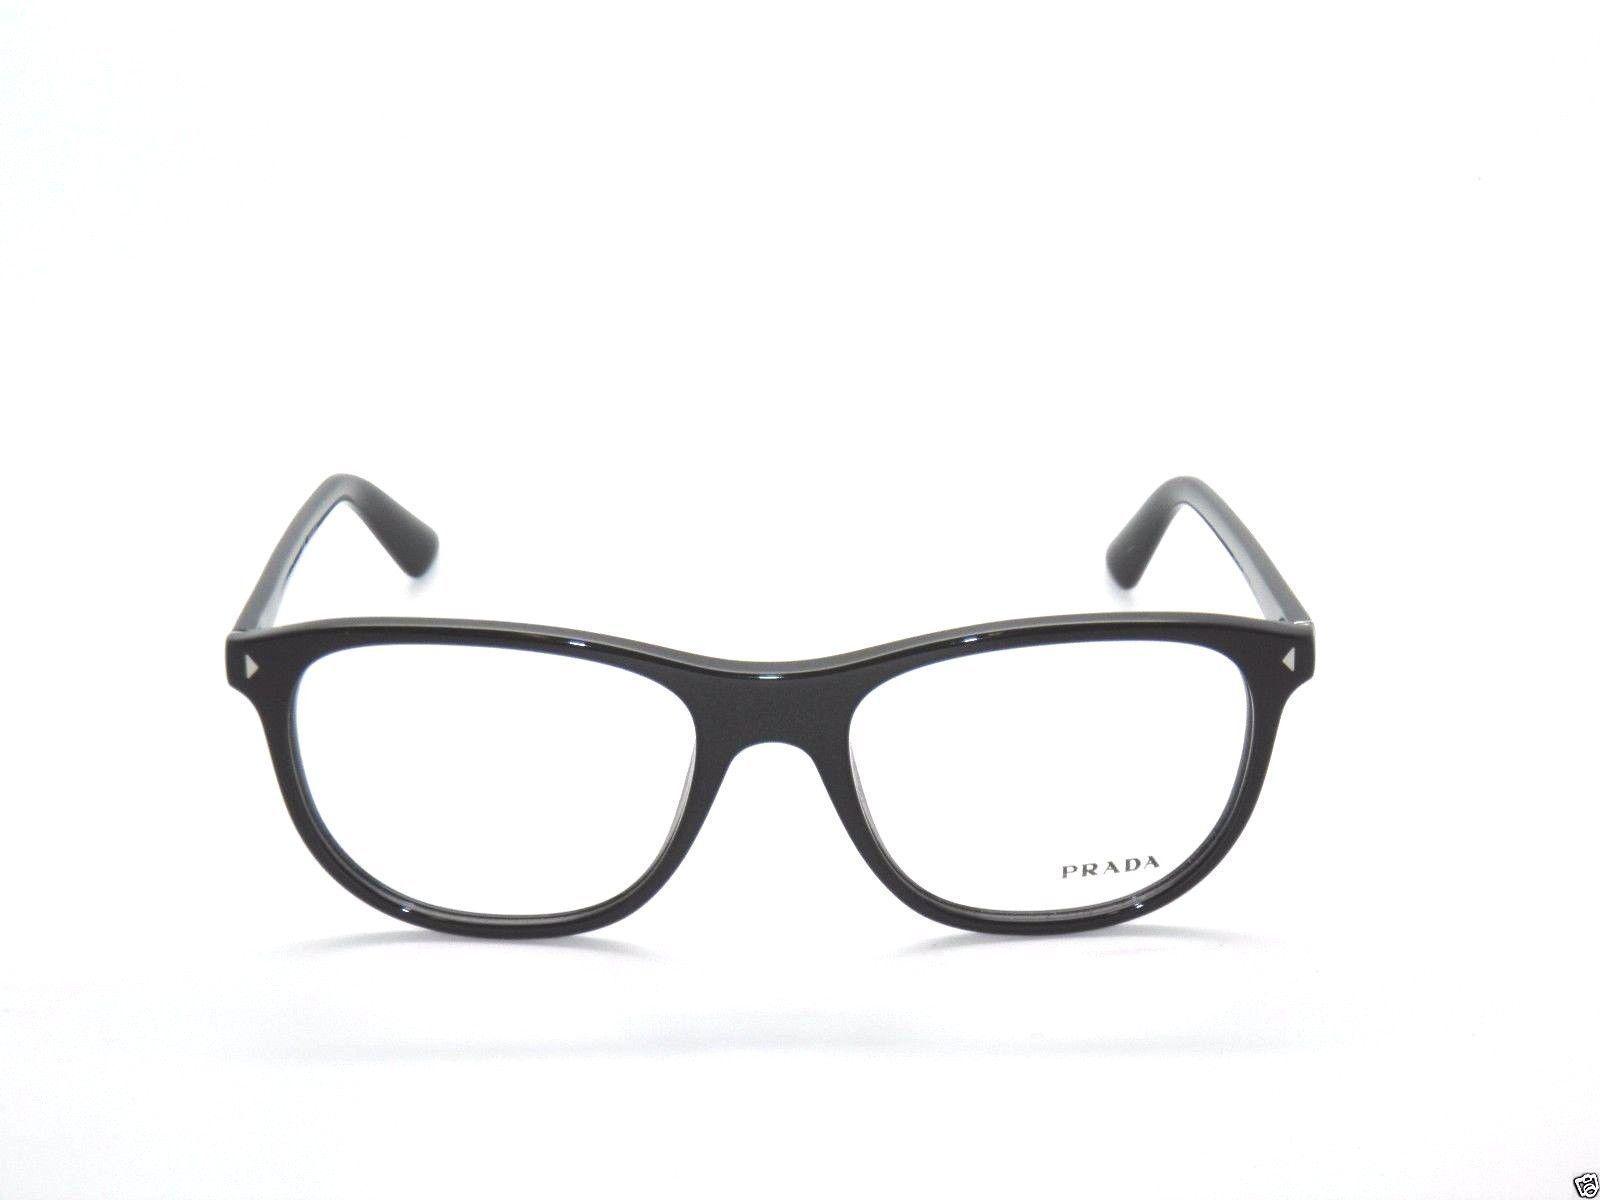 ee16316d8e2 Prada VPR 17R 1AB-1O1 Black Eyeglasses Frames 56mm - 123 - £47.12 GBP